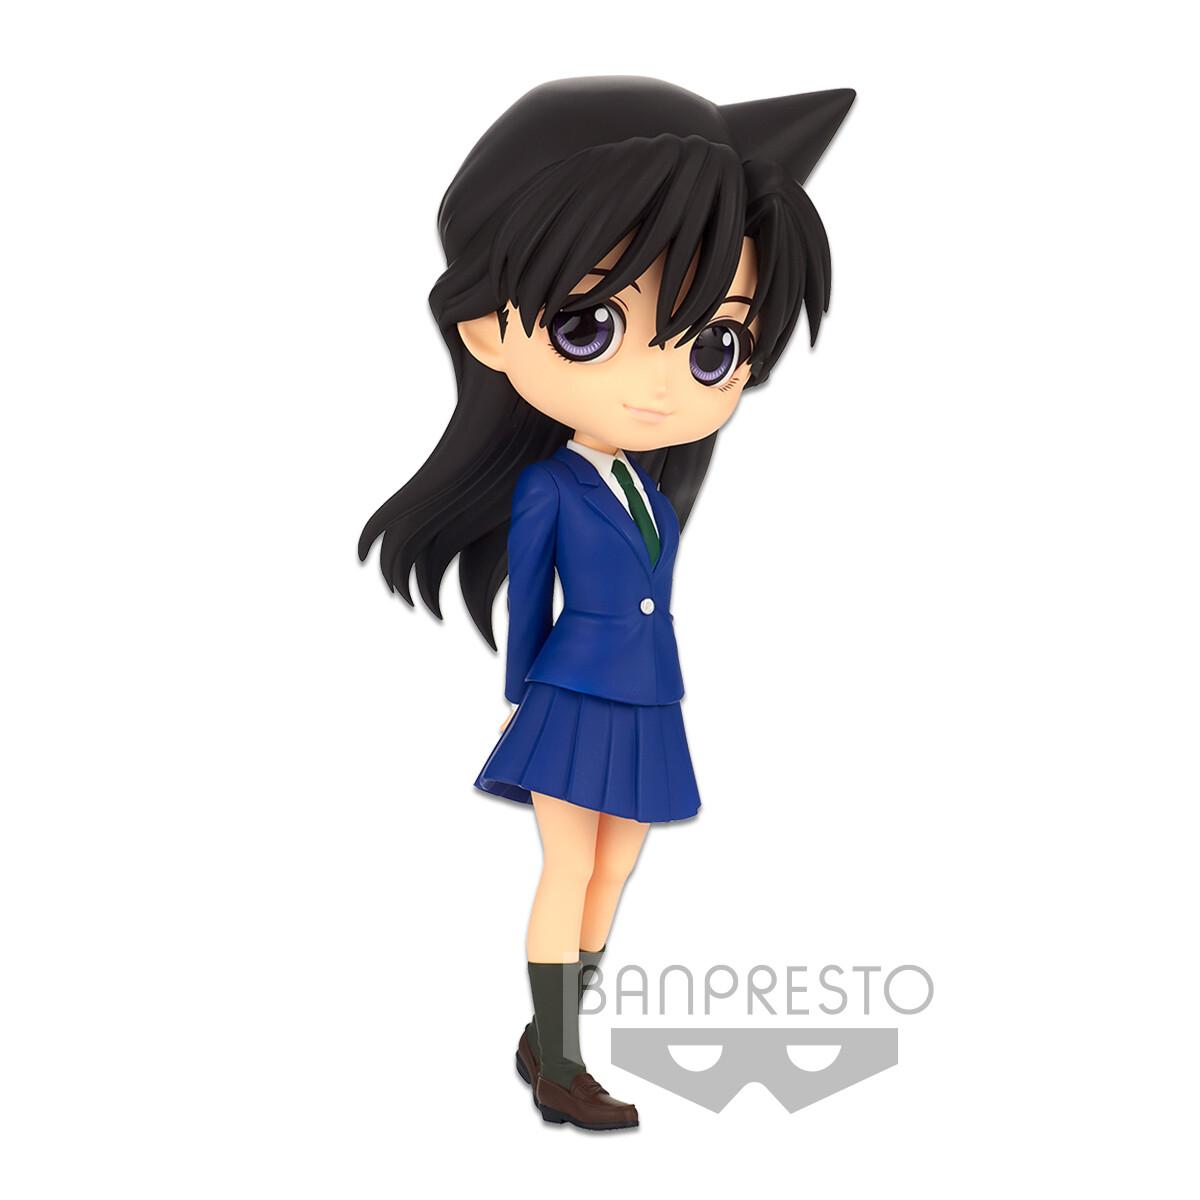 PRE-ORDER Banpresto Detective Conan Q Posket Ran Mori Ver. A